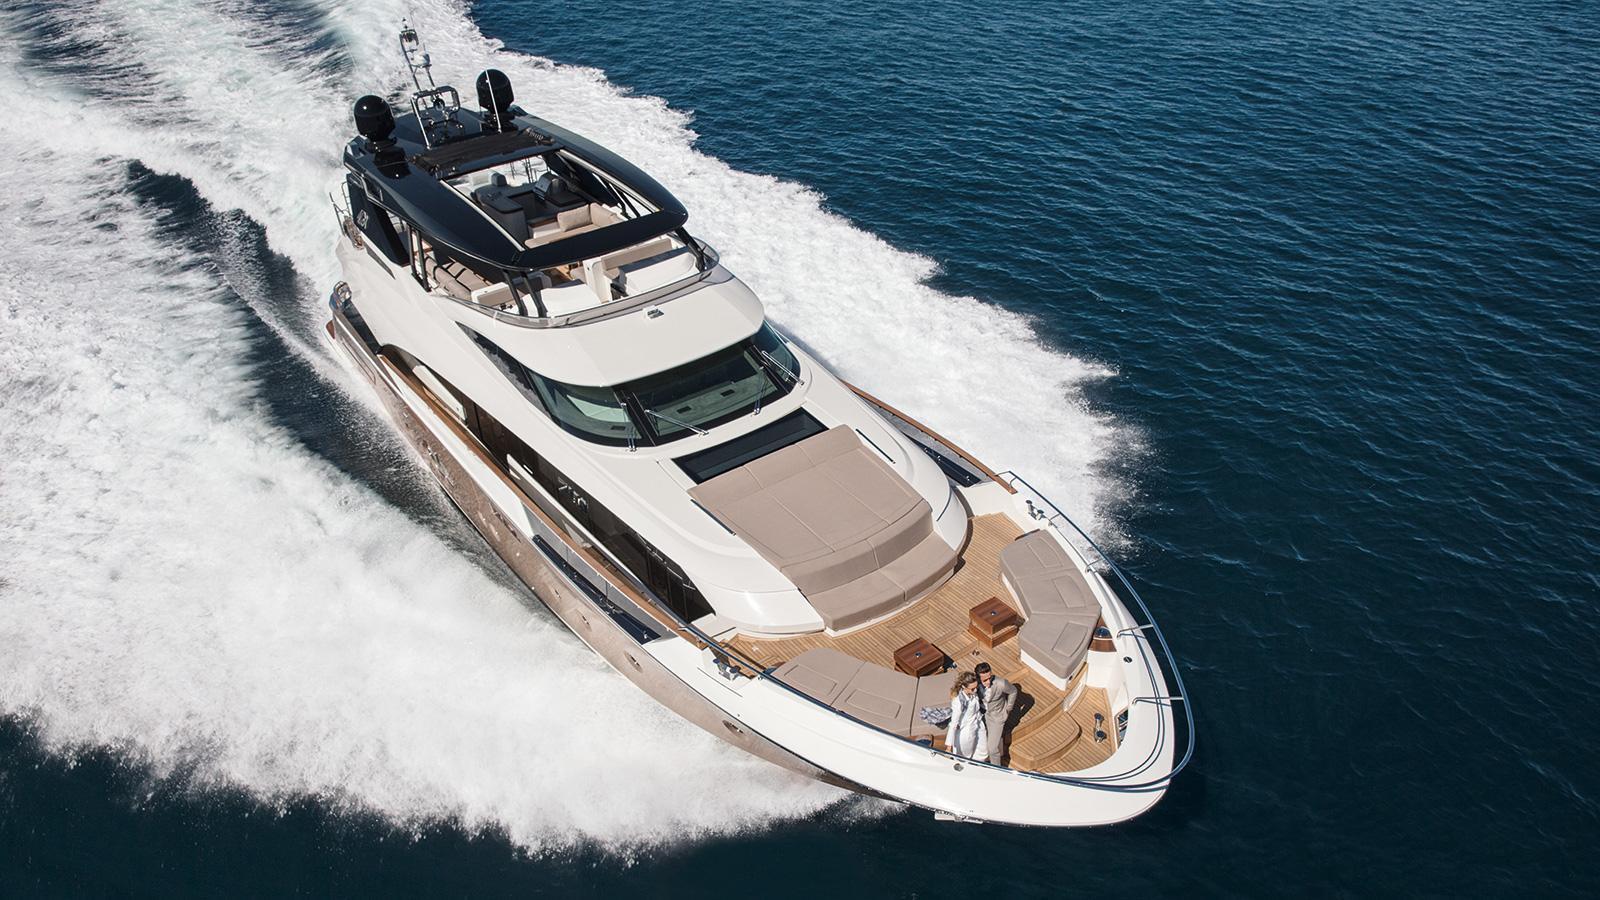 running-shot-of-the-monte-carlo-yachts-96-mia